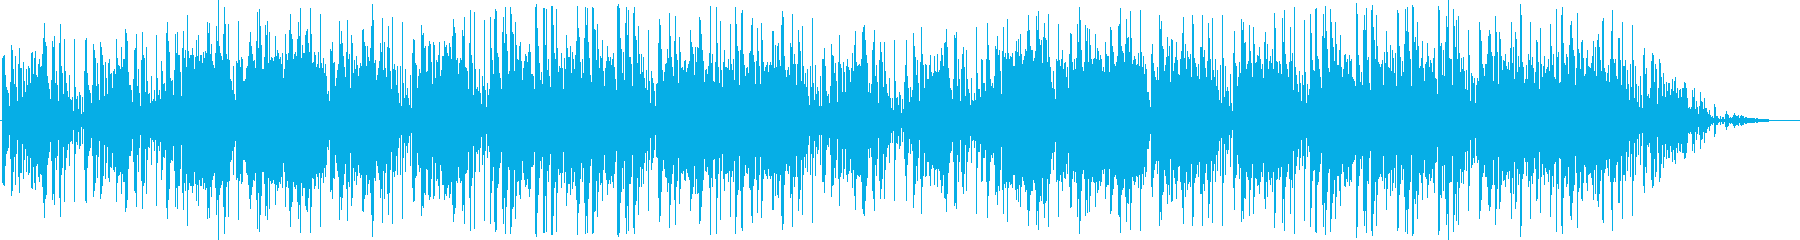 RPGフィールドBGM風オーケストラ曲3の再生済みの波形